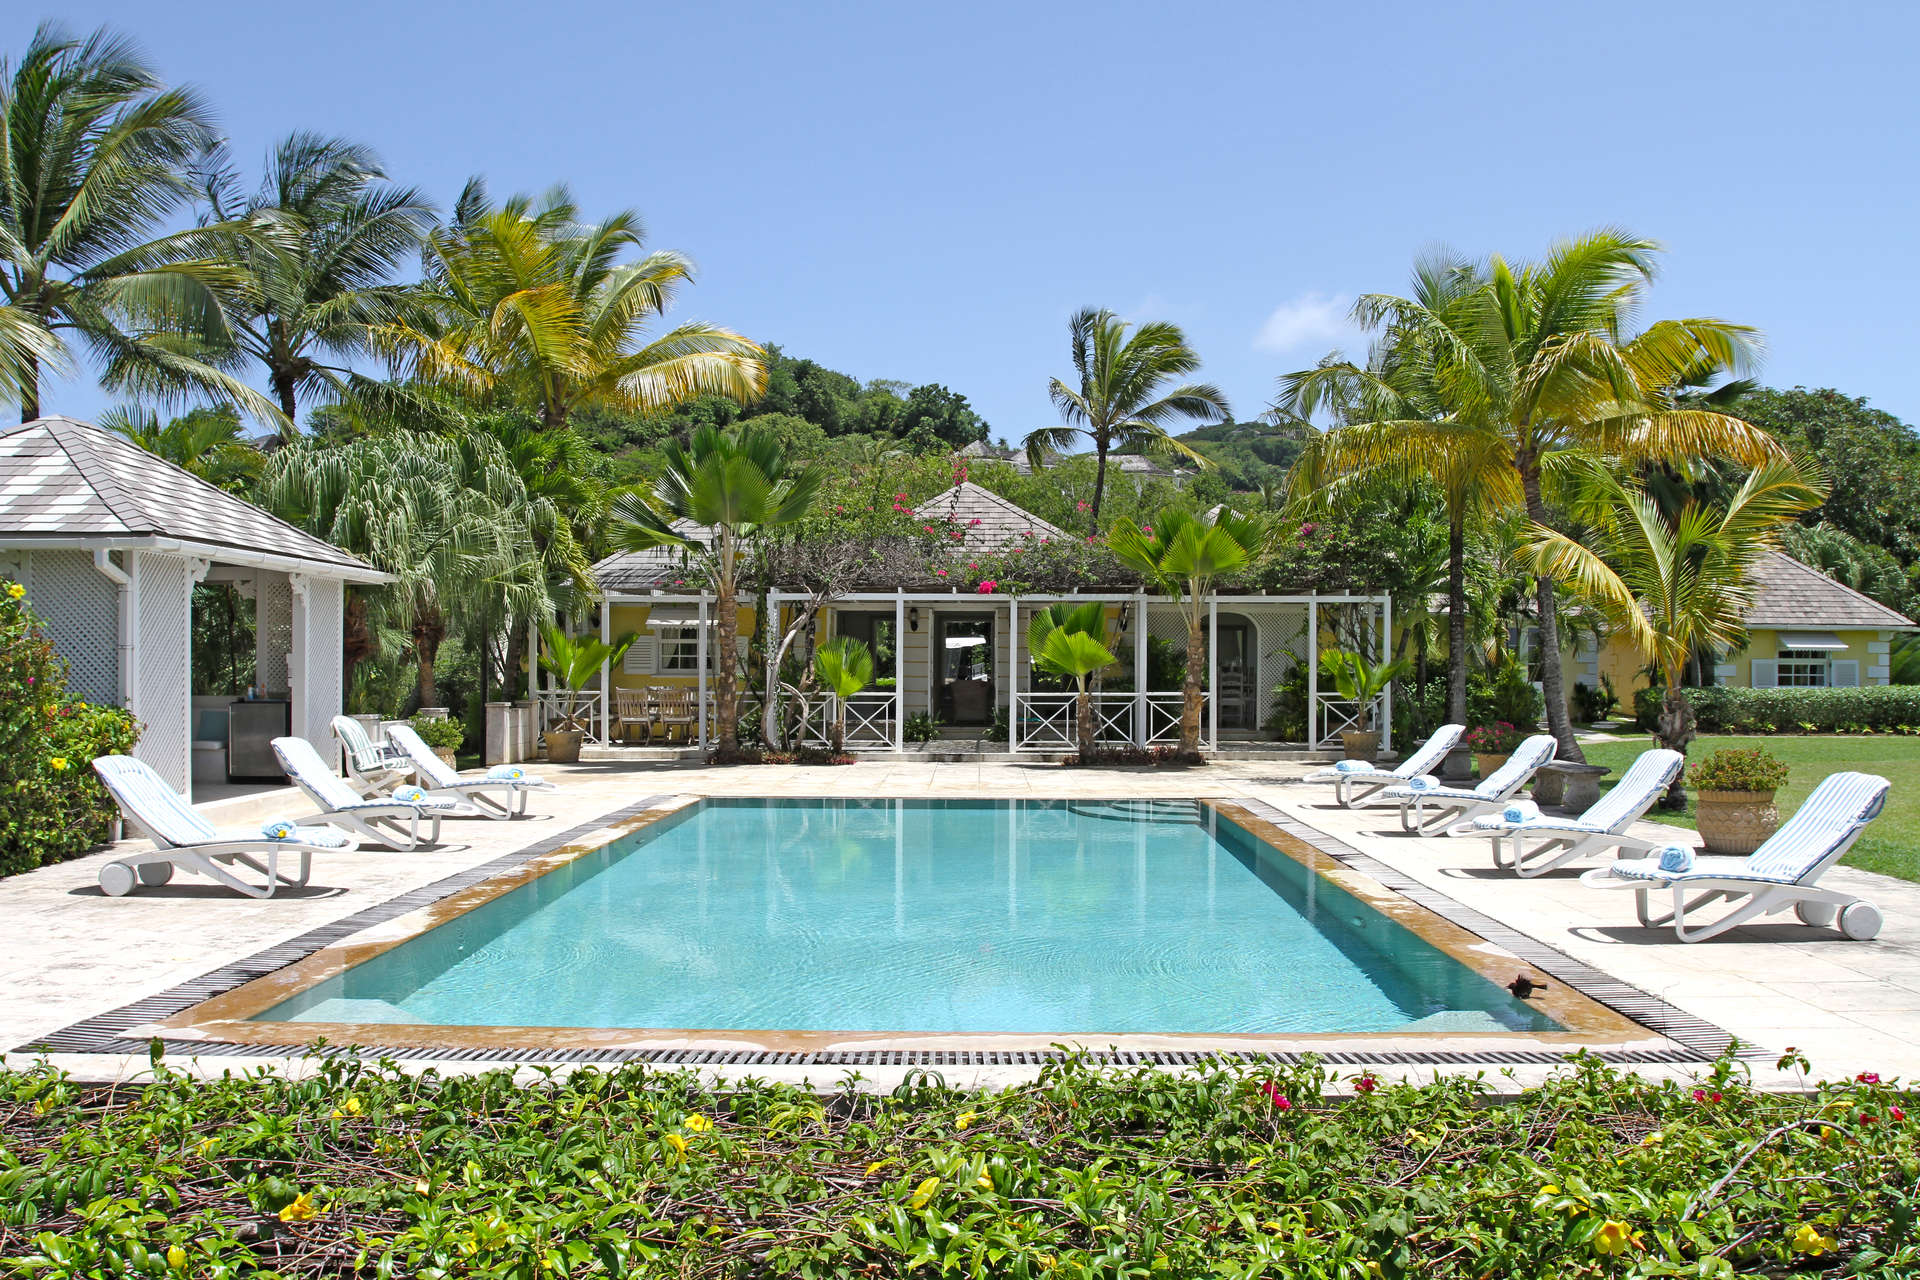 Luxury villa rentals caribbean - St vincent and the grenadines - St vincent - Mustique - Gingerbread - Image 1/12